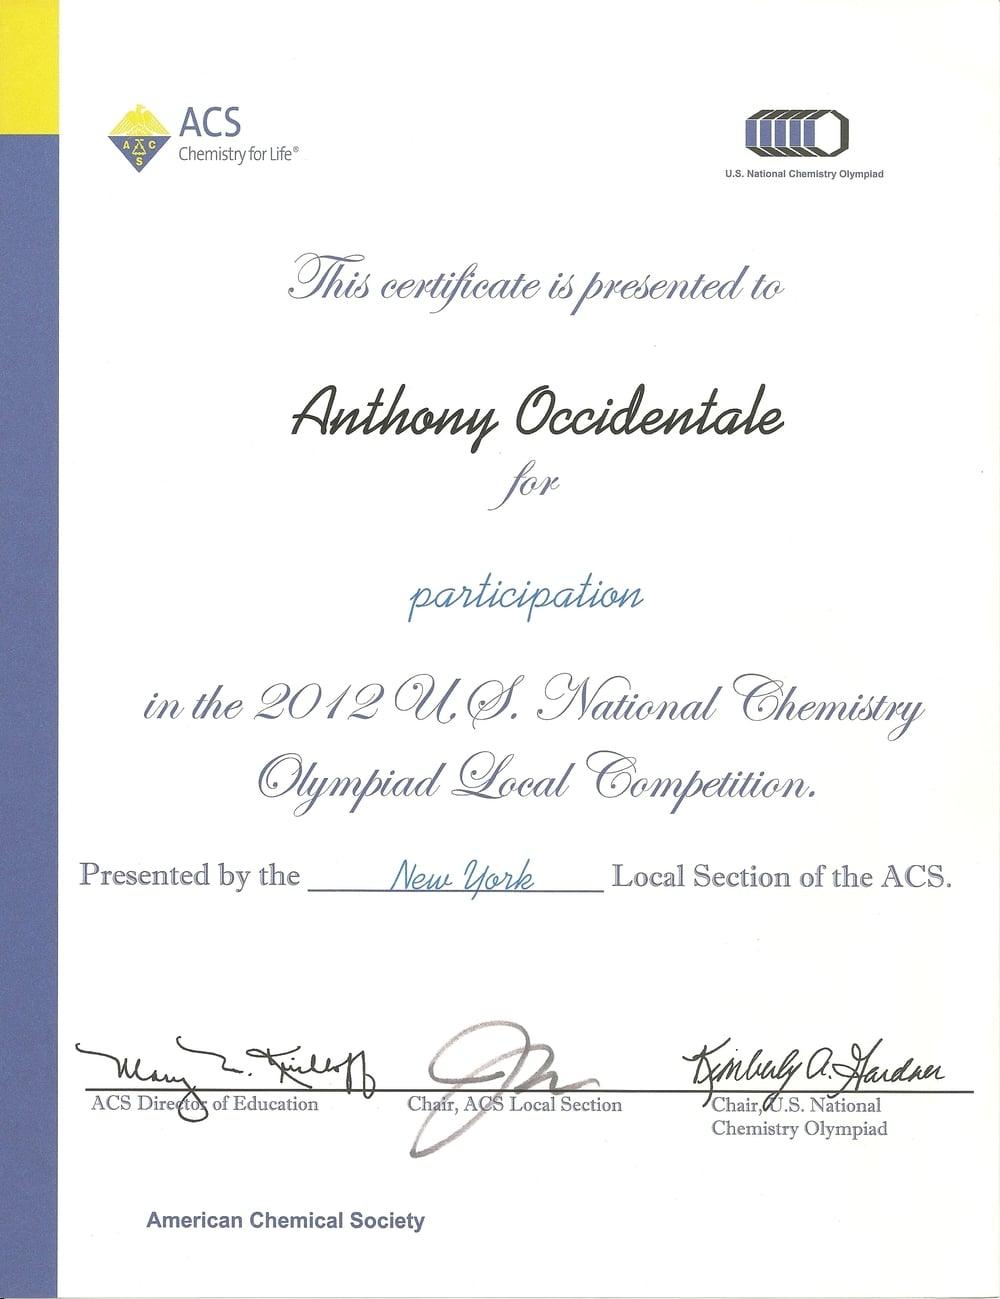 2012 US National Chemistry Olympiad